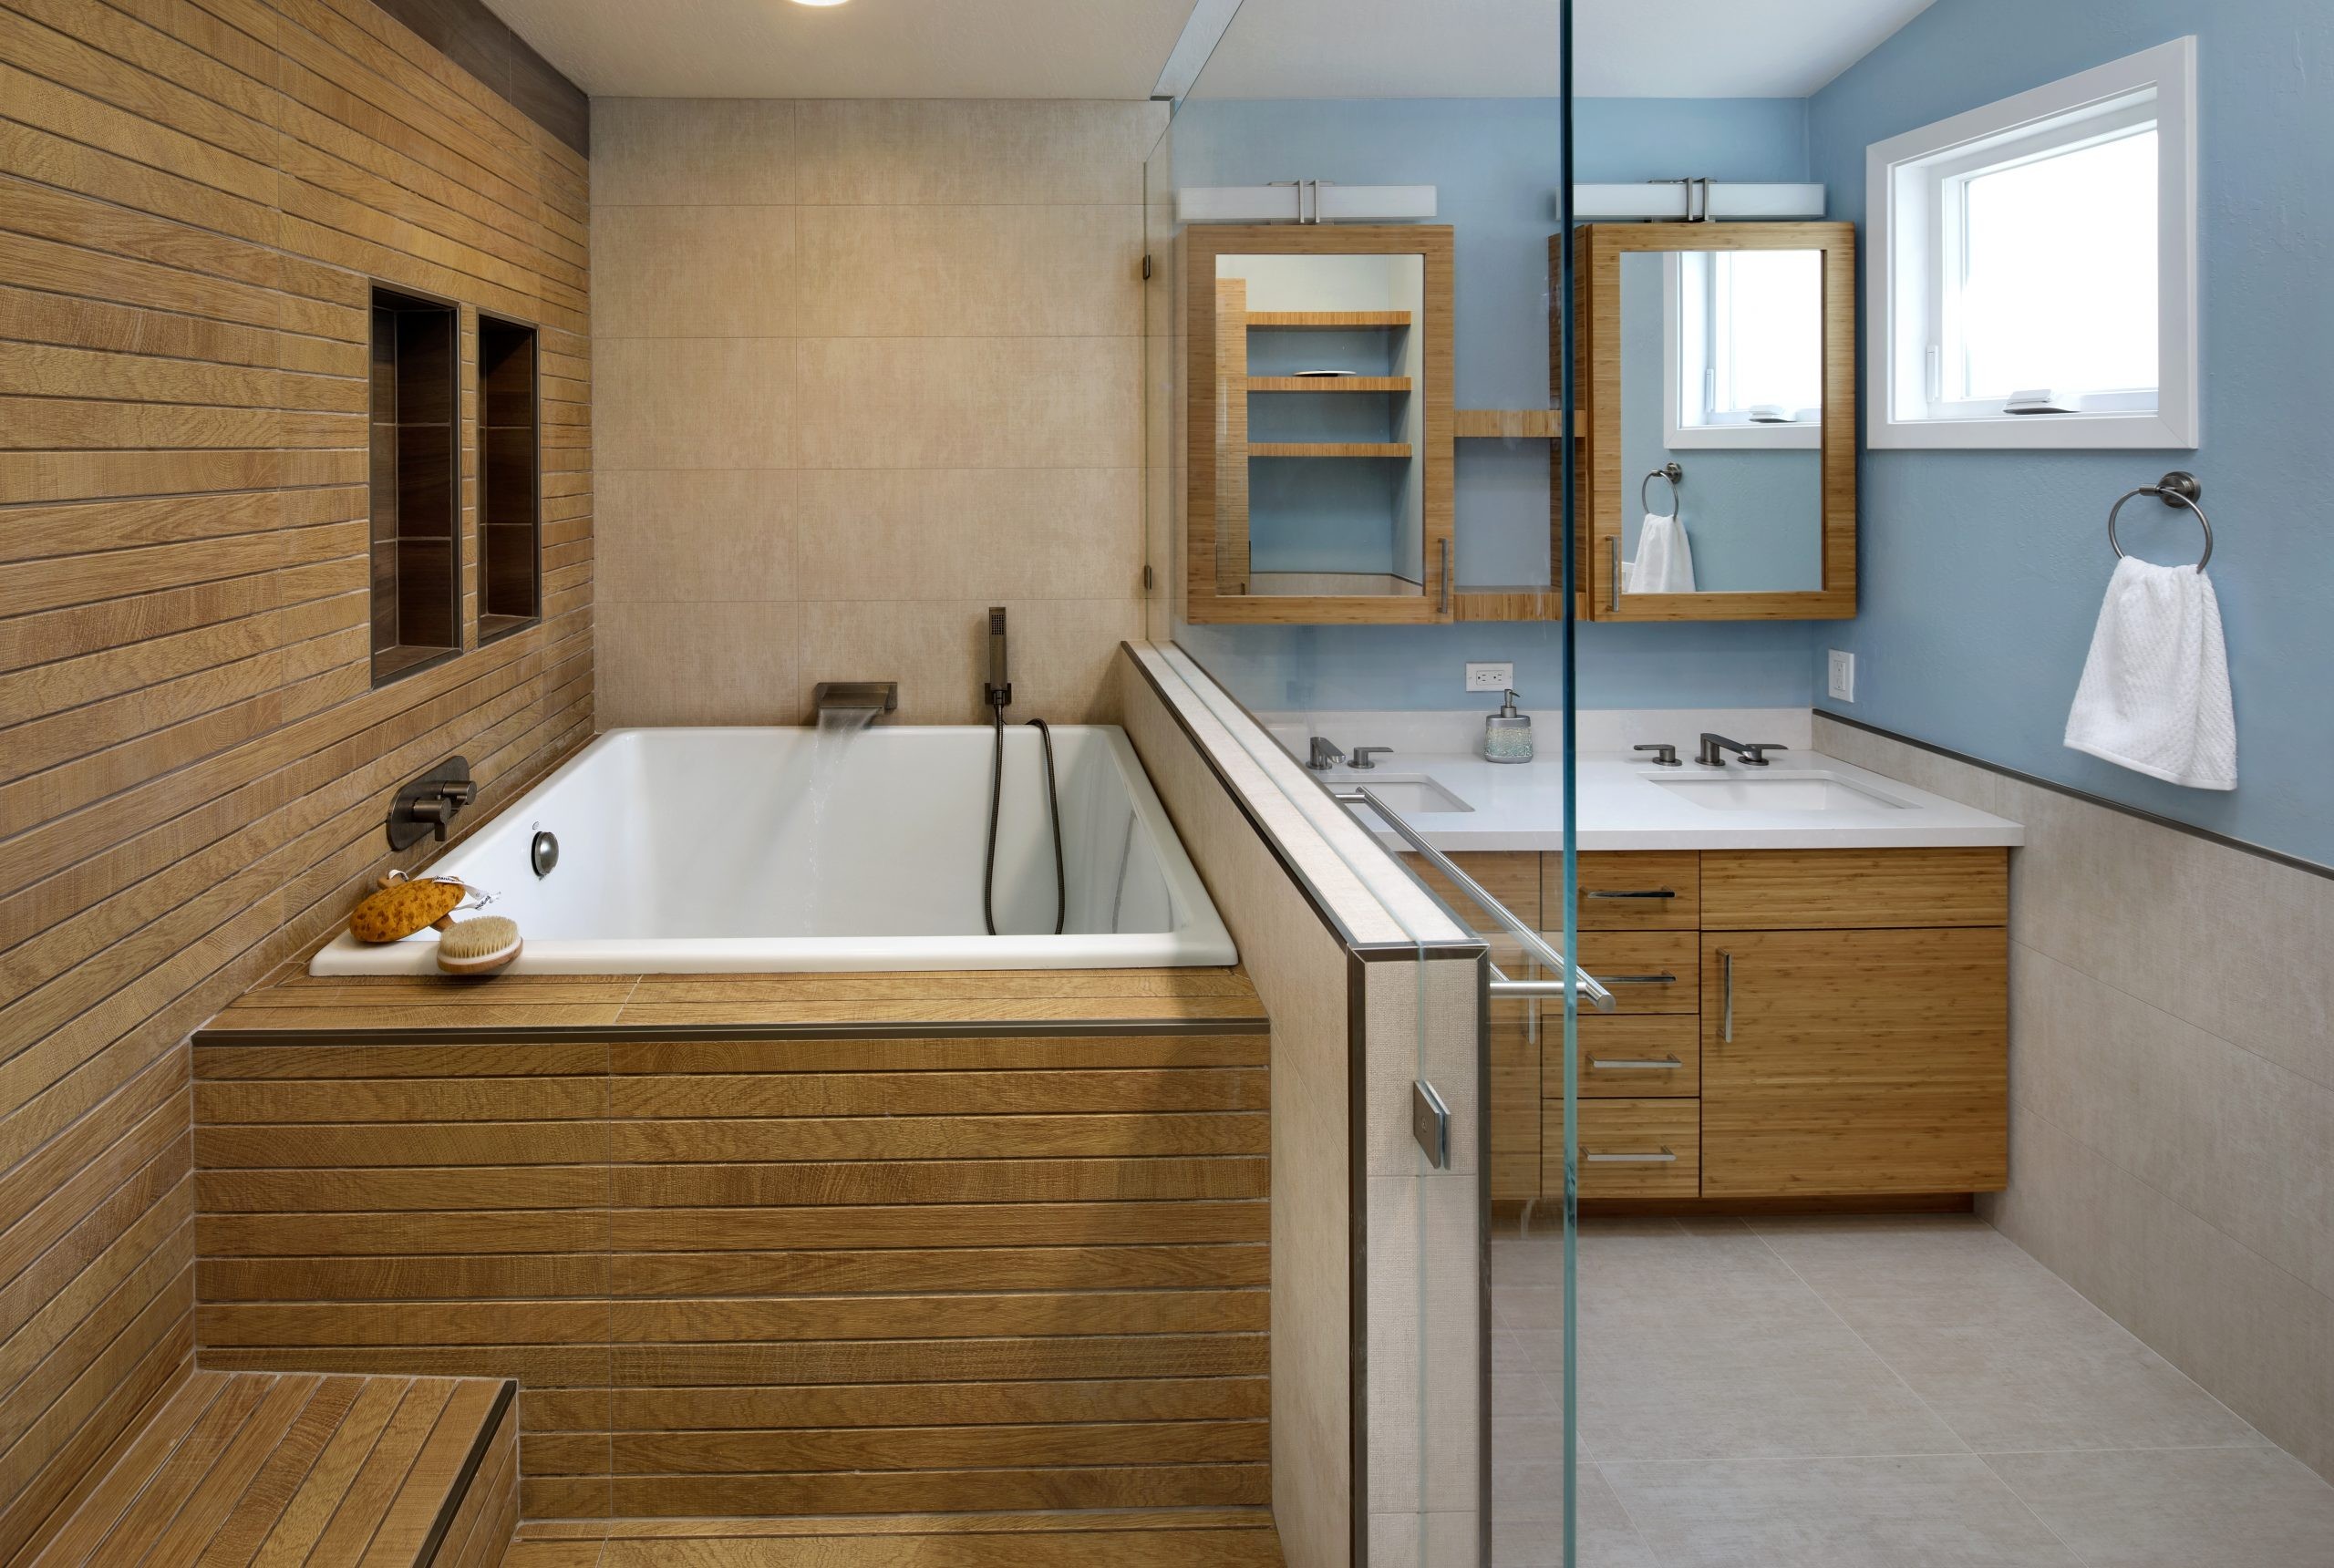 A Japanese bathroom renovation with an ofuro style bath tub.